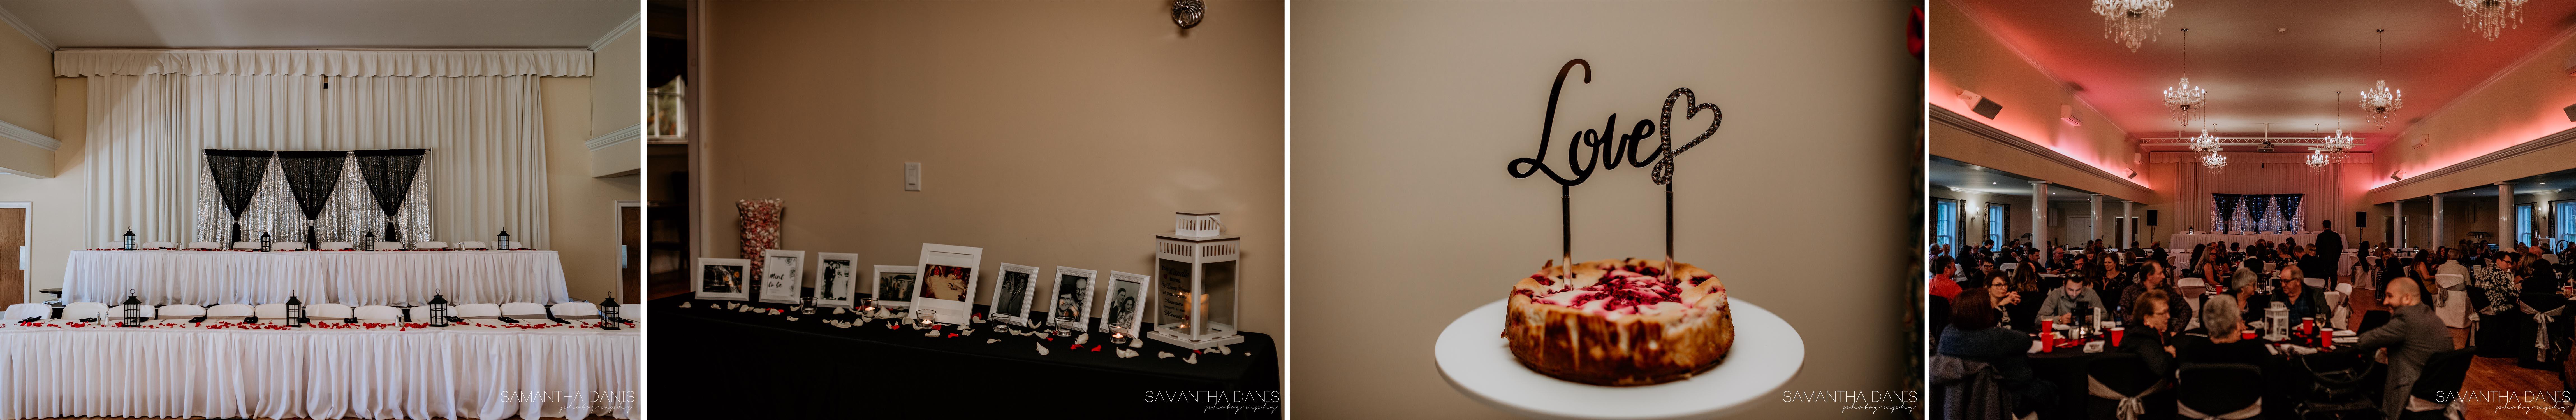 Wedding reception Quebec Fort Coulonge Samantha Danis Photography